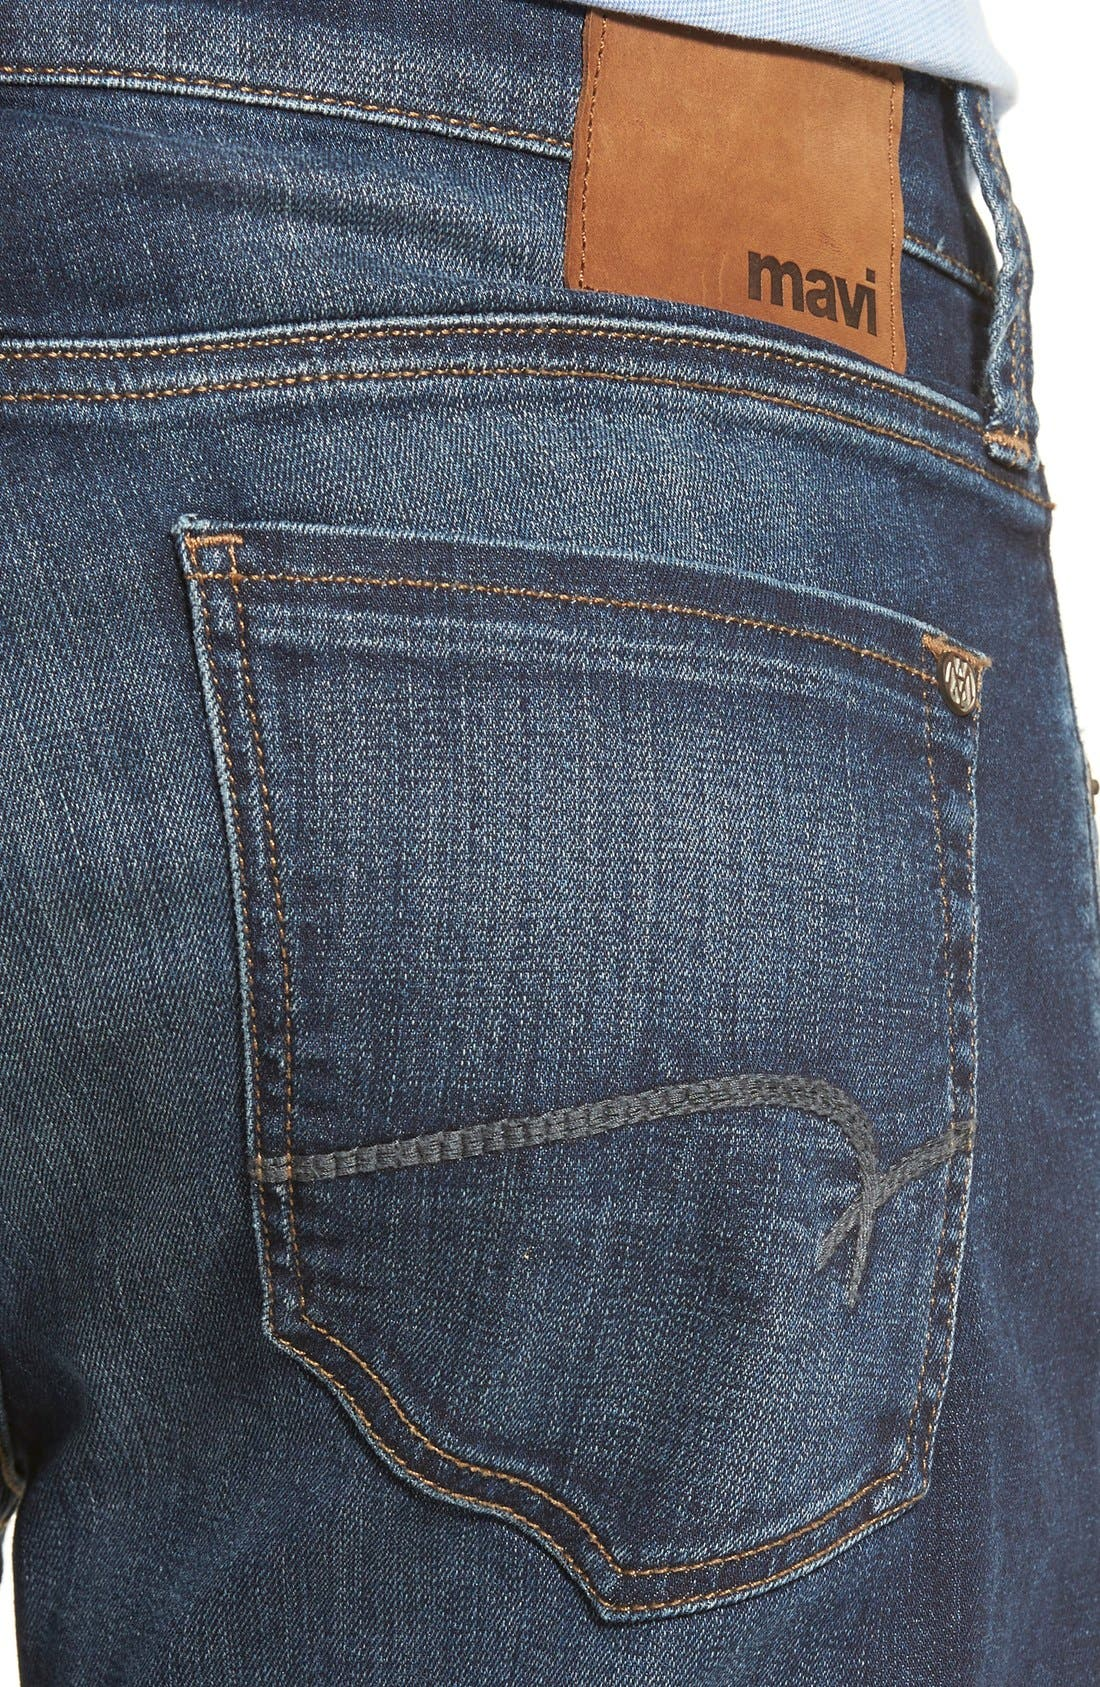 MAVI JEANS,                             Zach Straight Leg Jeans,                             Alternate thumbnail 7, color,                             DARK BRUSHED WILLIAMSBURG